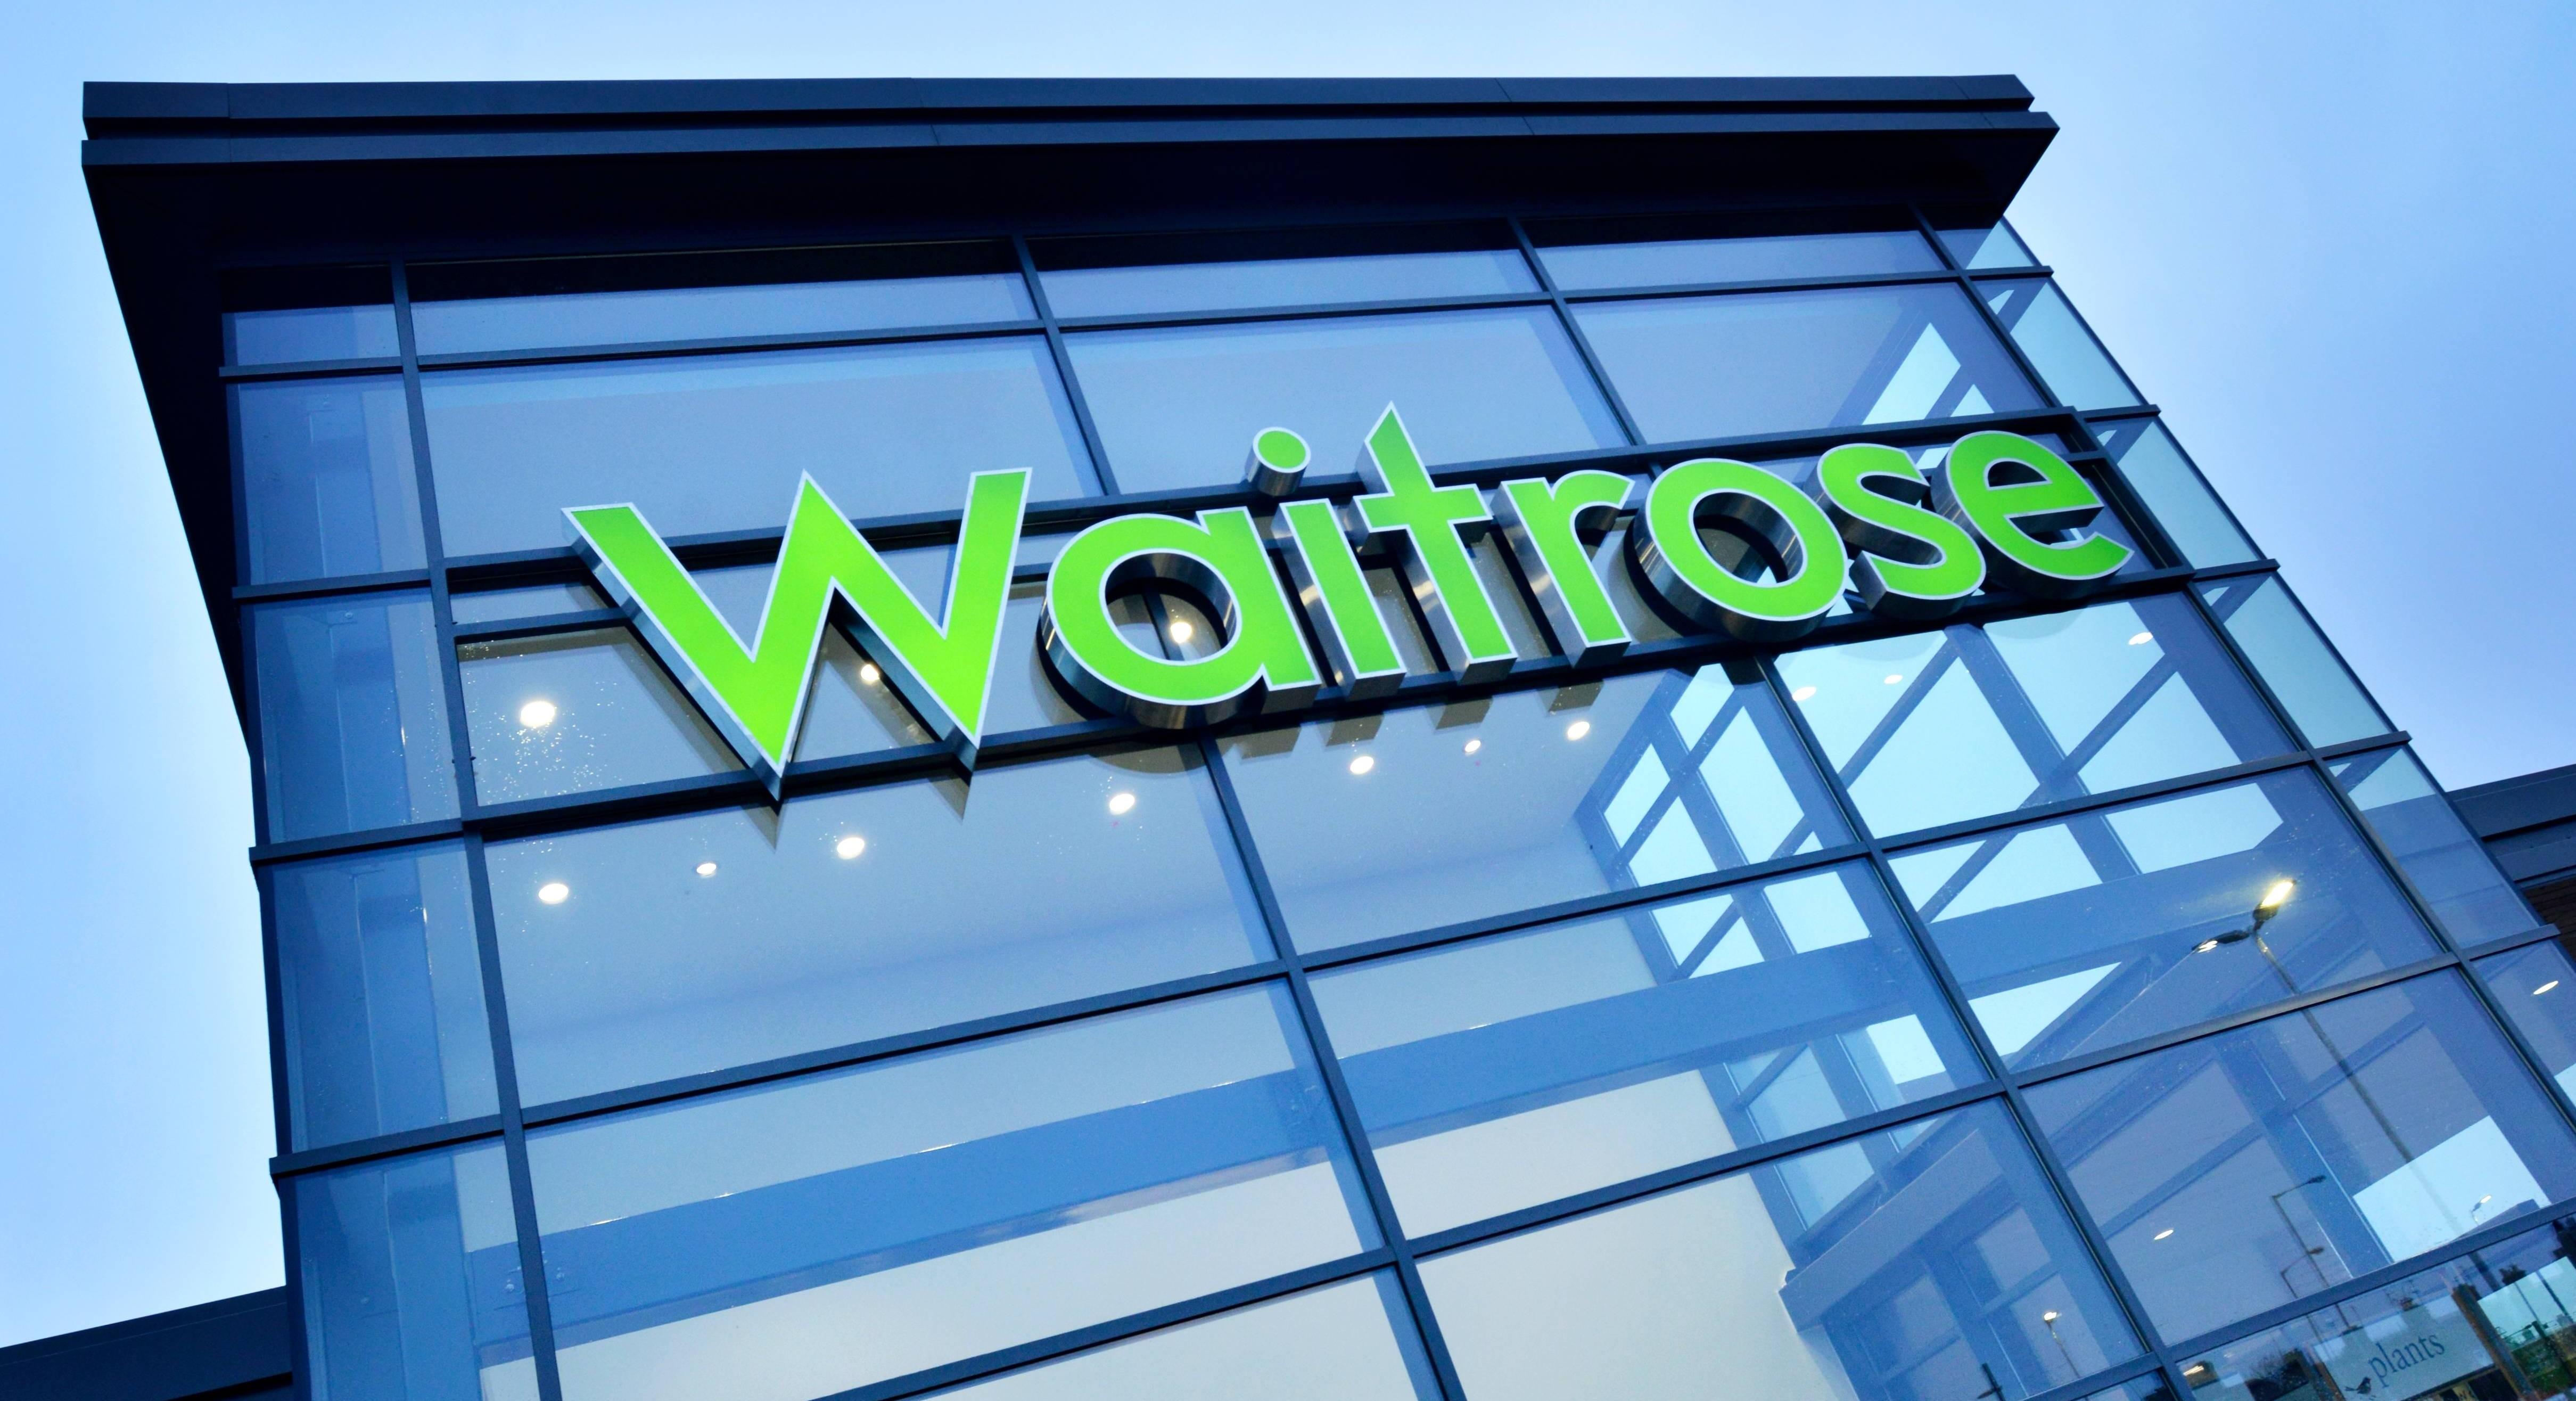 Waitrose Loyalty Promotion Driving Sales